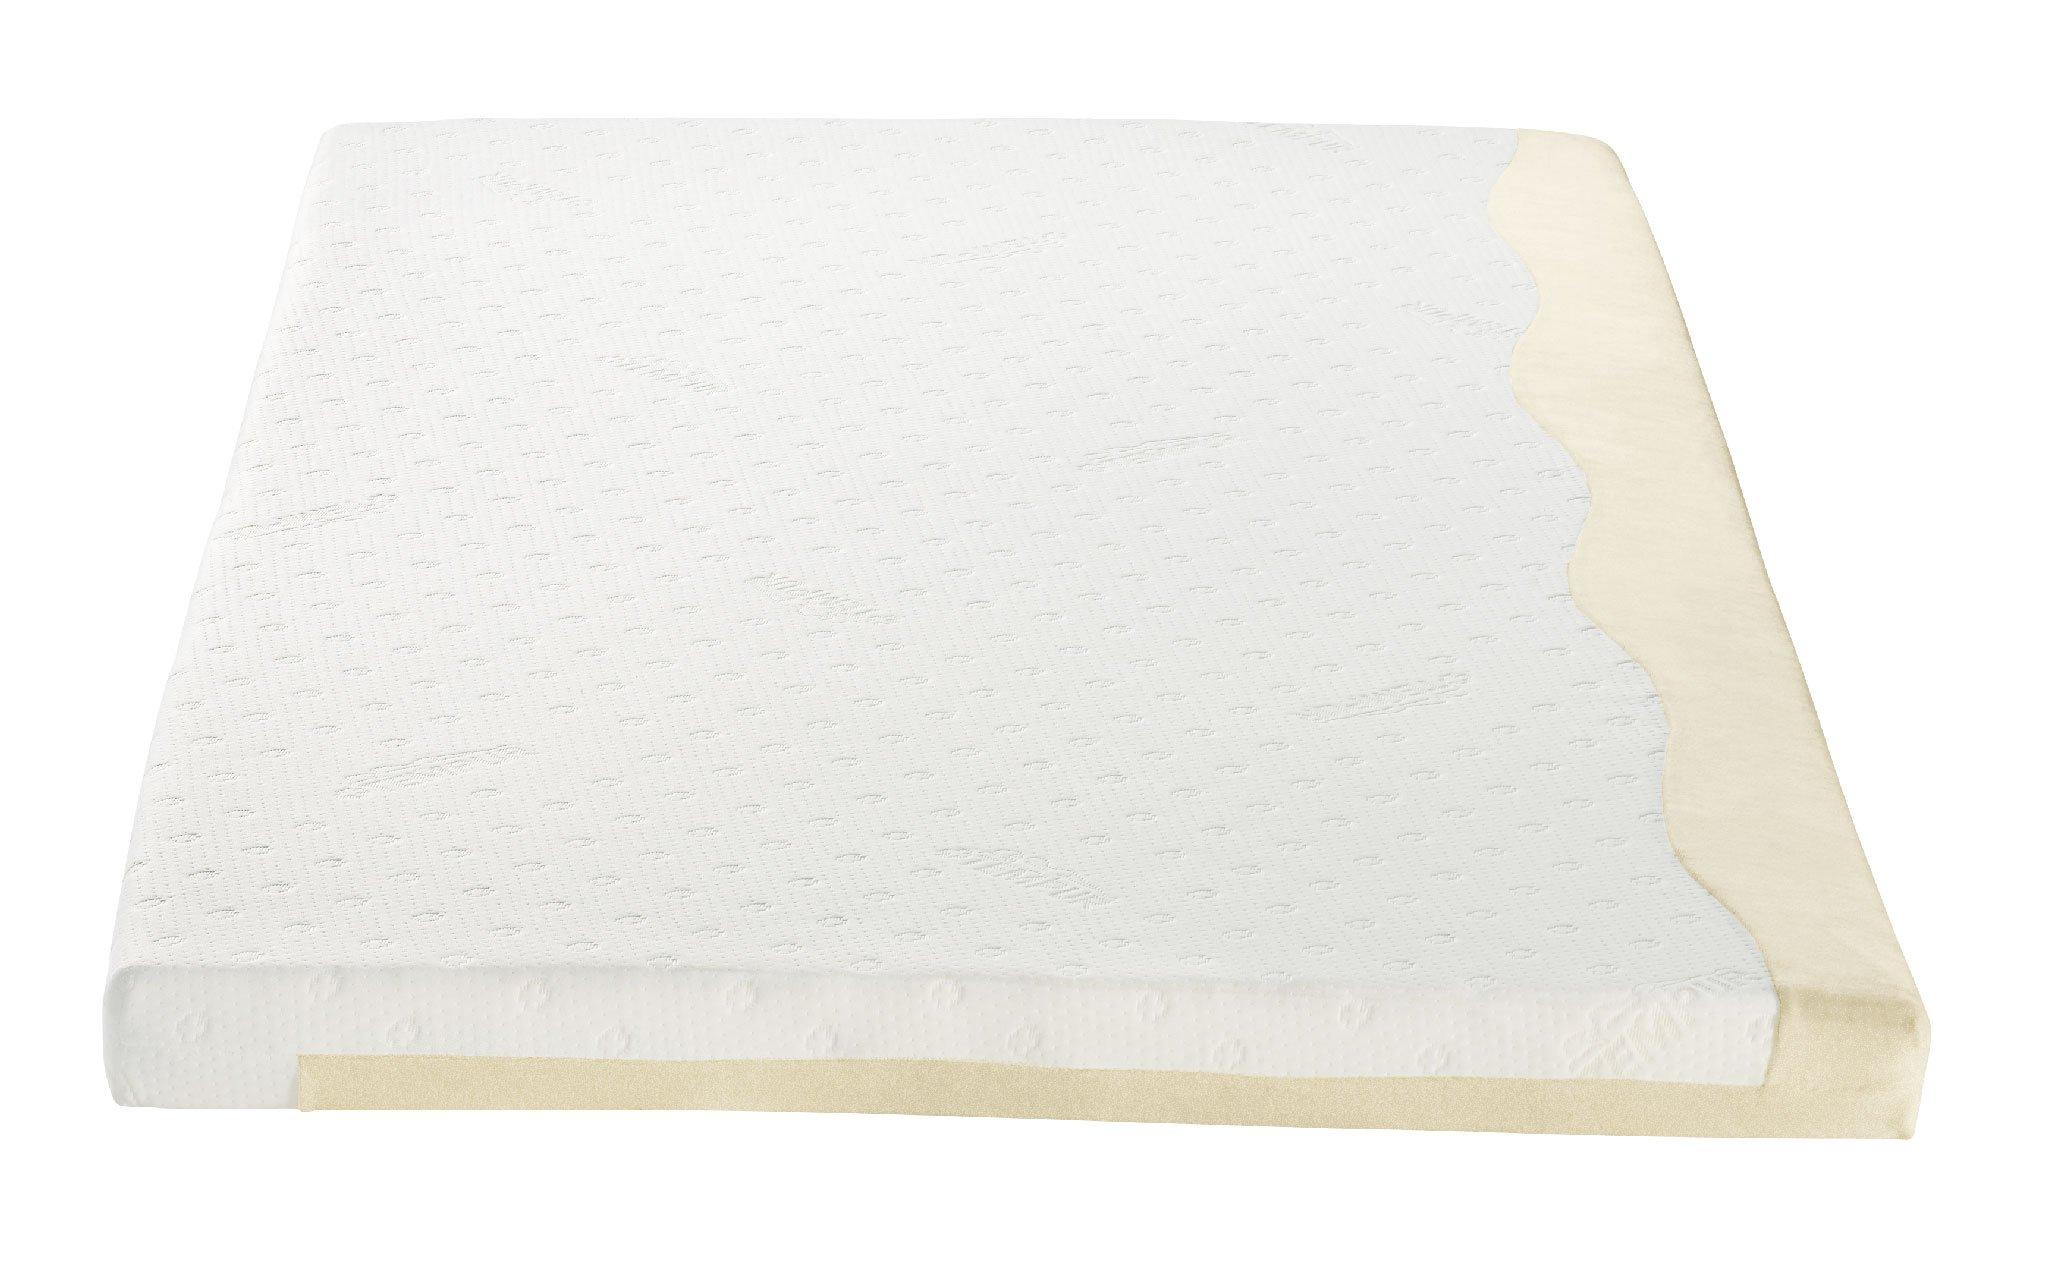 TEMPUR® Bäddmadrass 7 cm 2 Side Comfort Topper